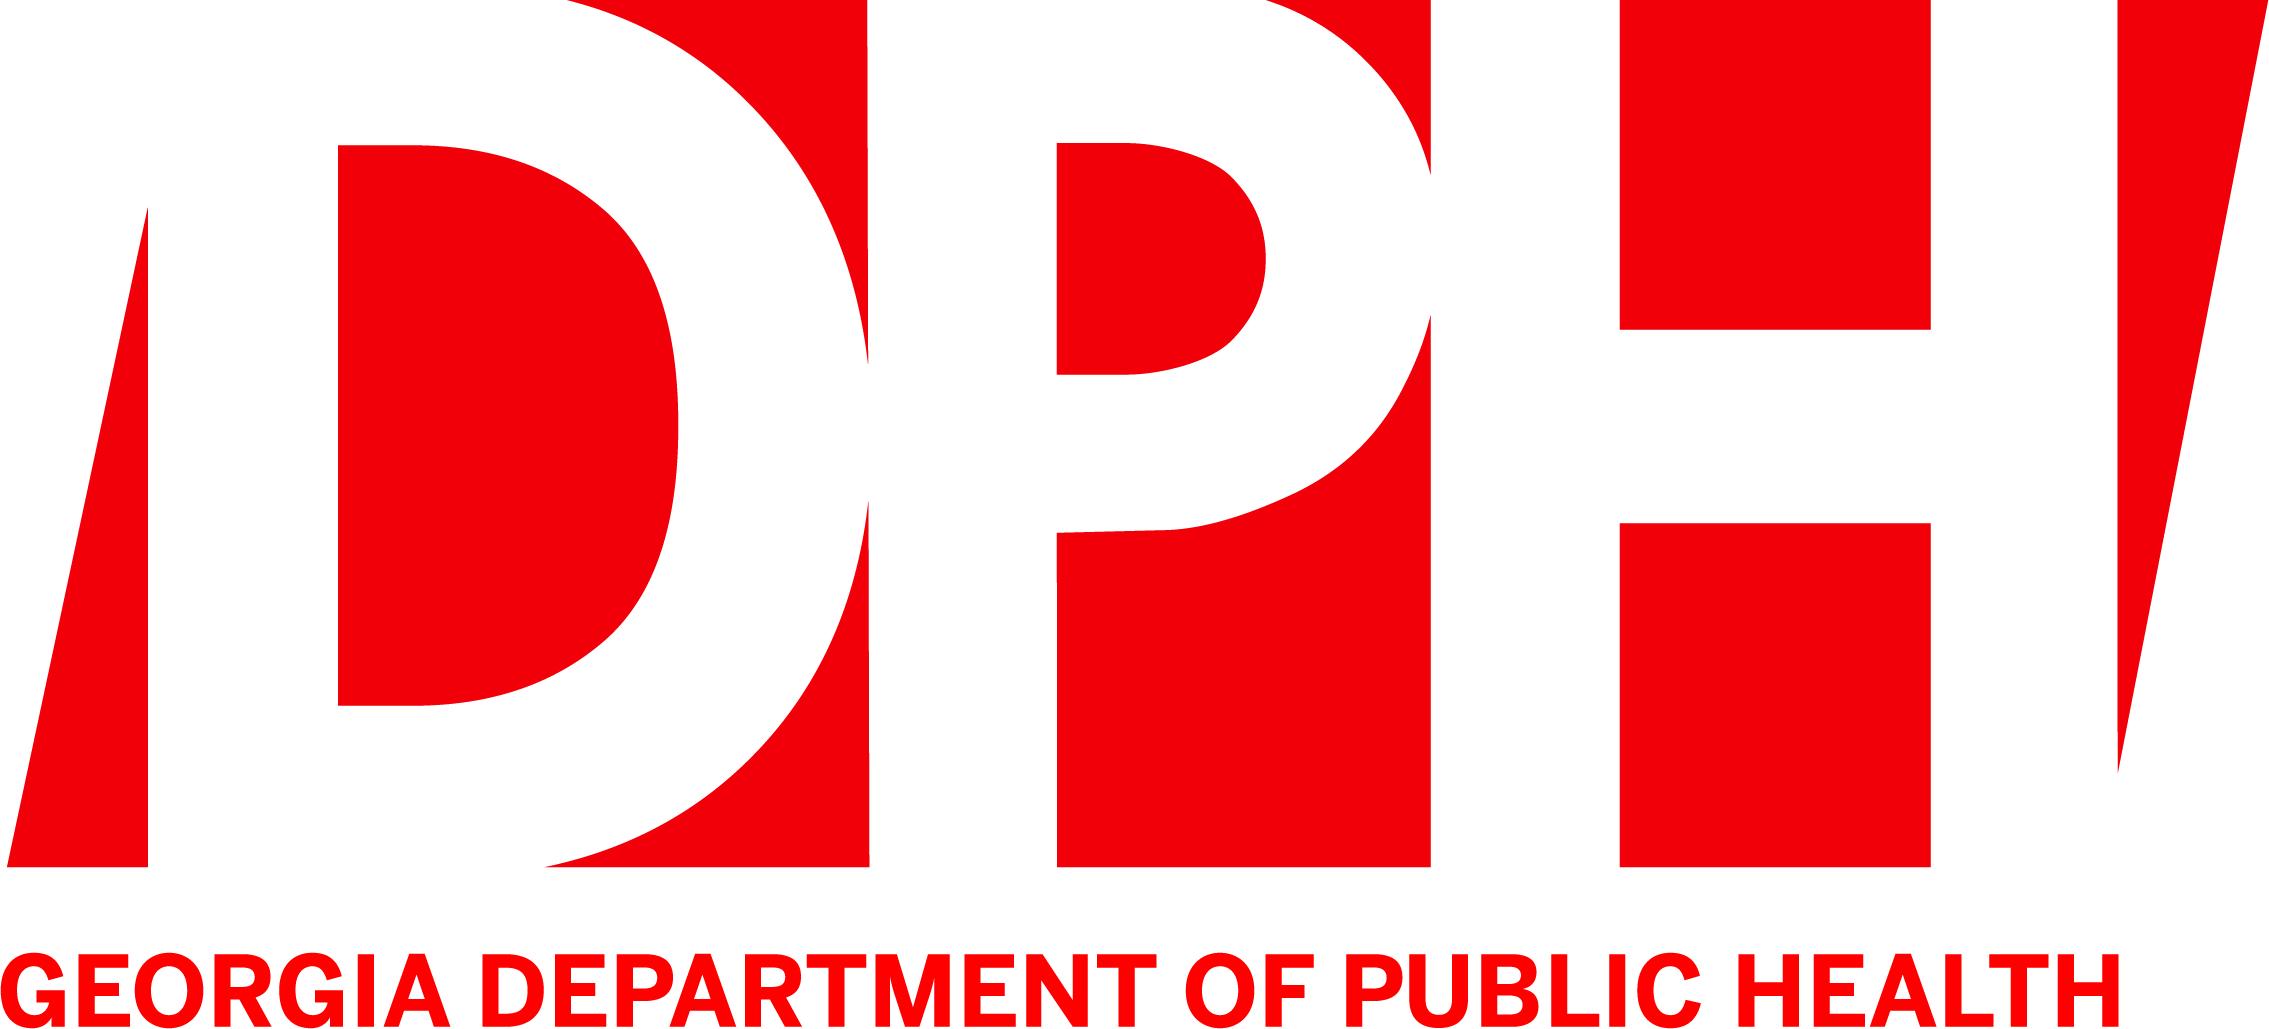 DPH_RED_Horizontal_new